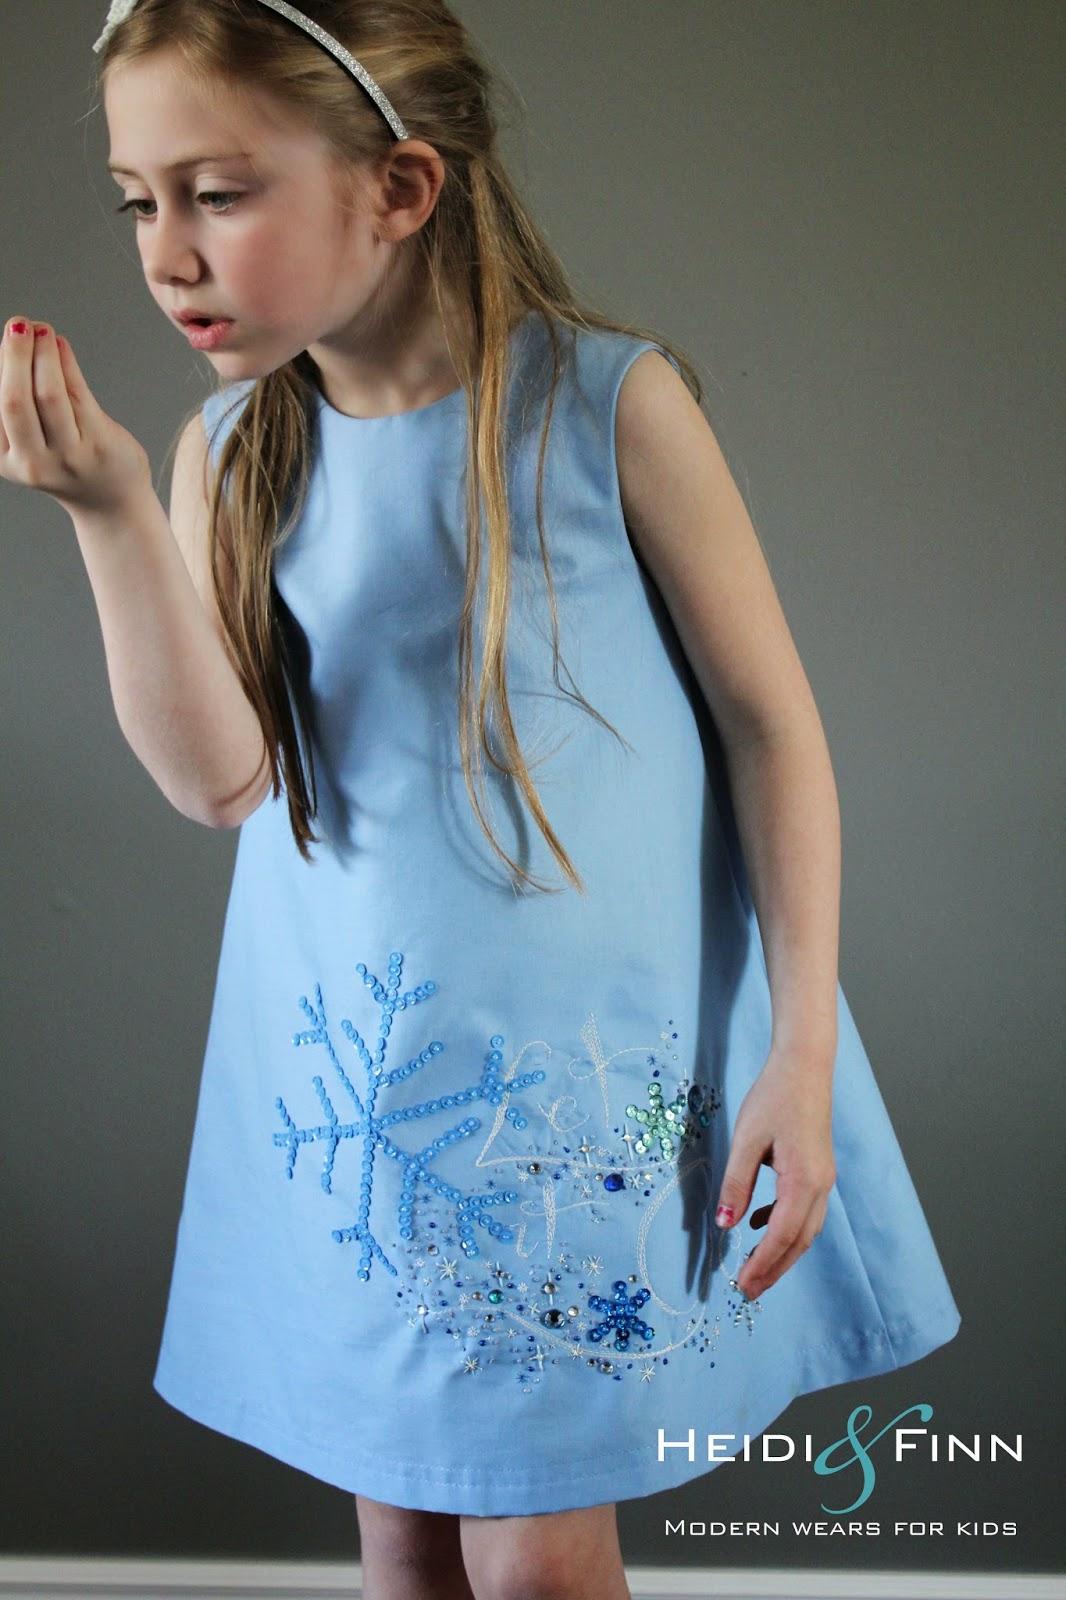 Heidiandfinn modern wears for kids let it go frozen inspired dress a mouse house creation pattern